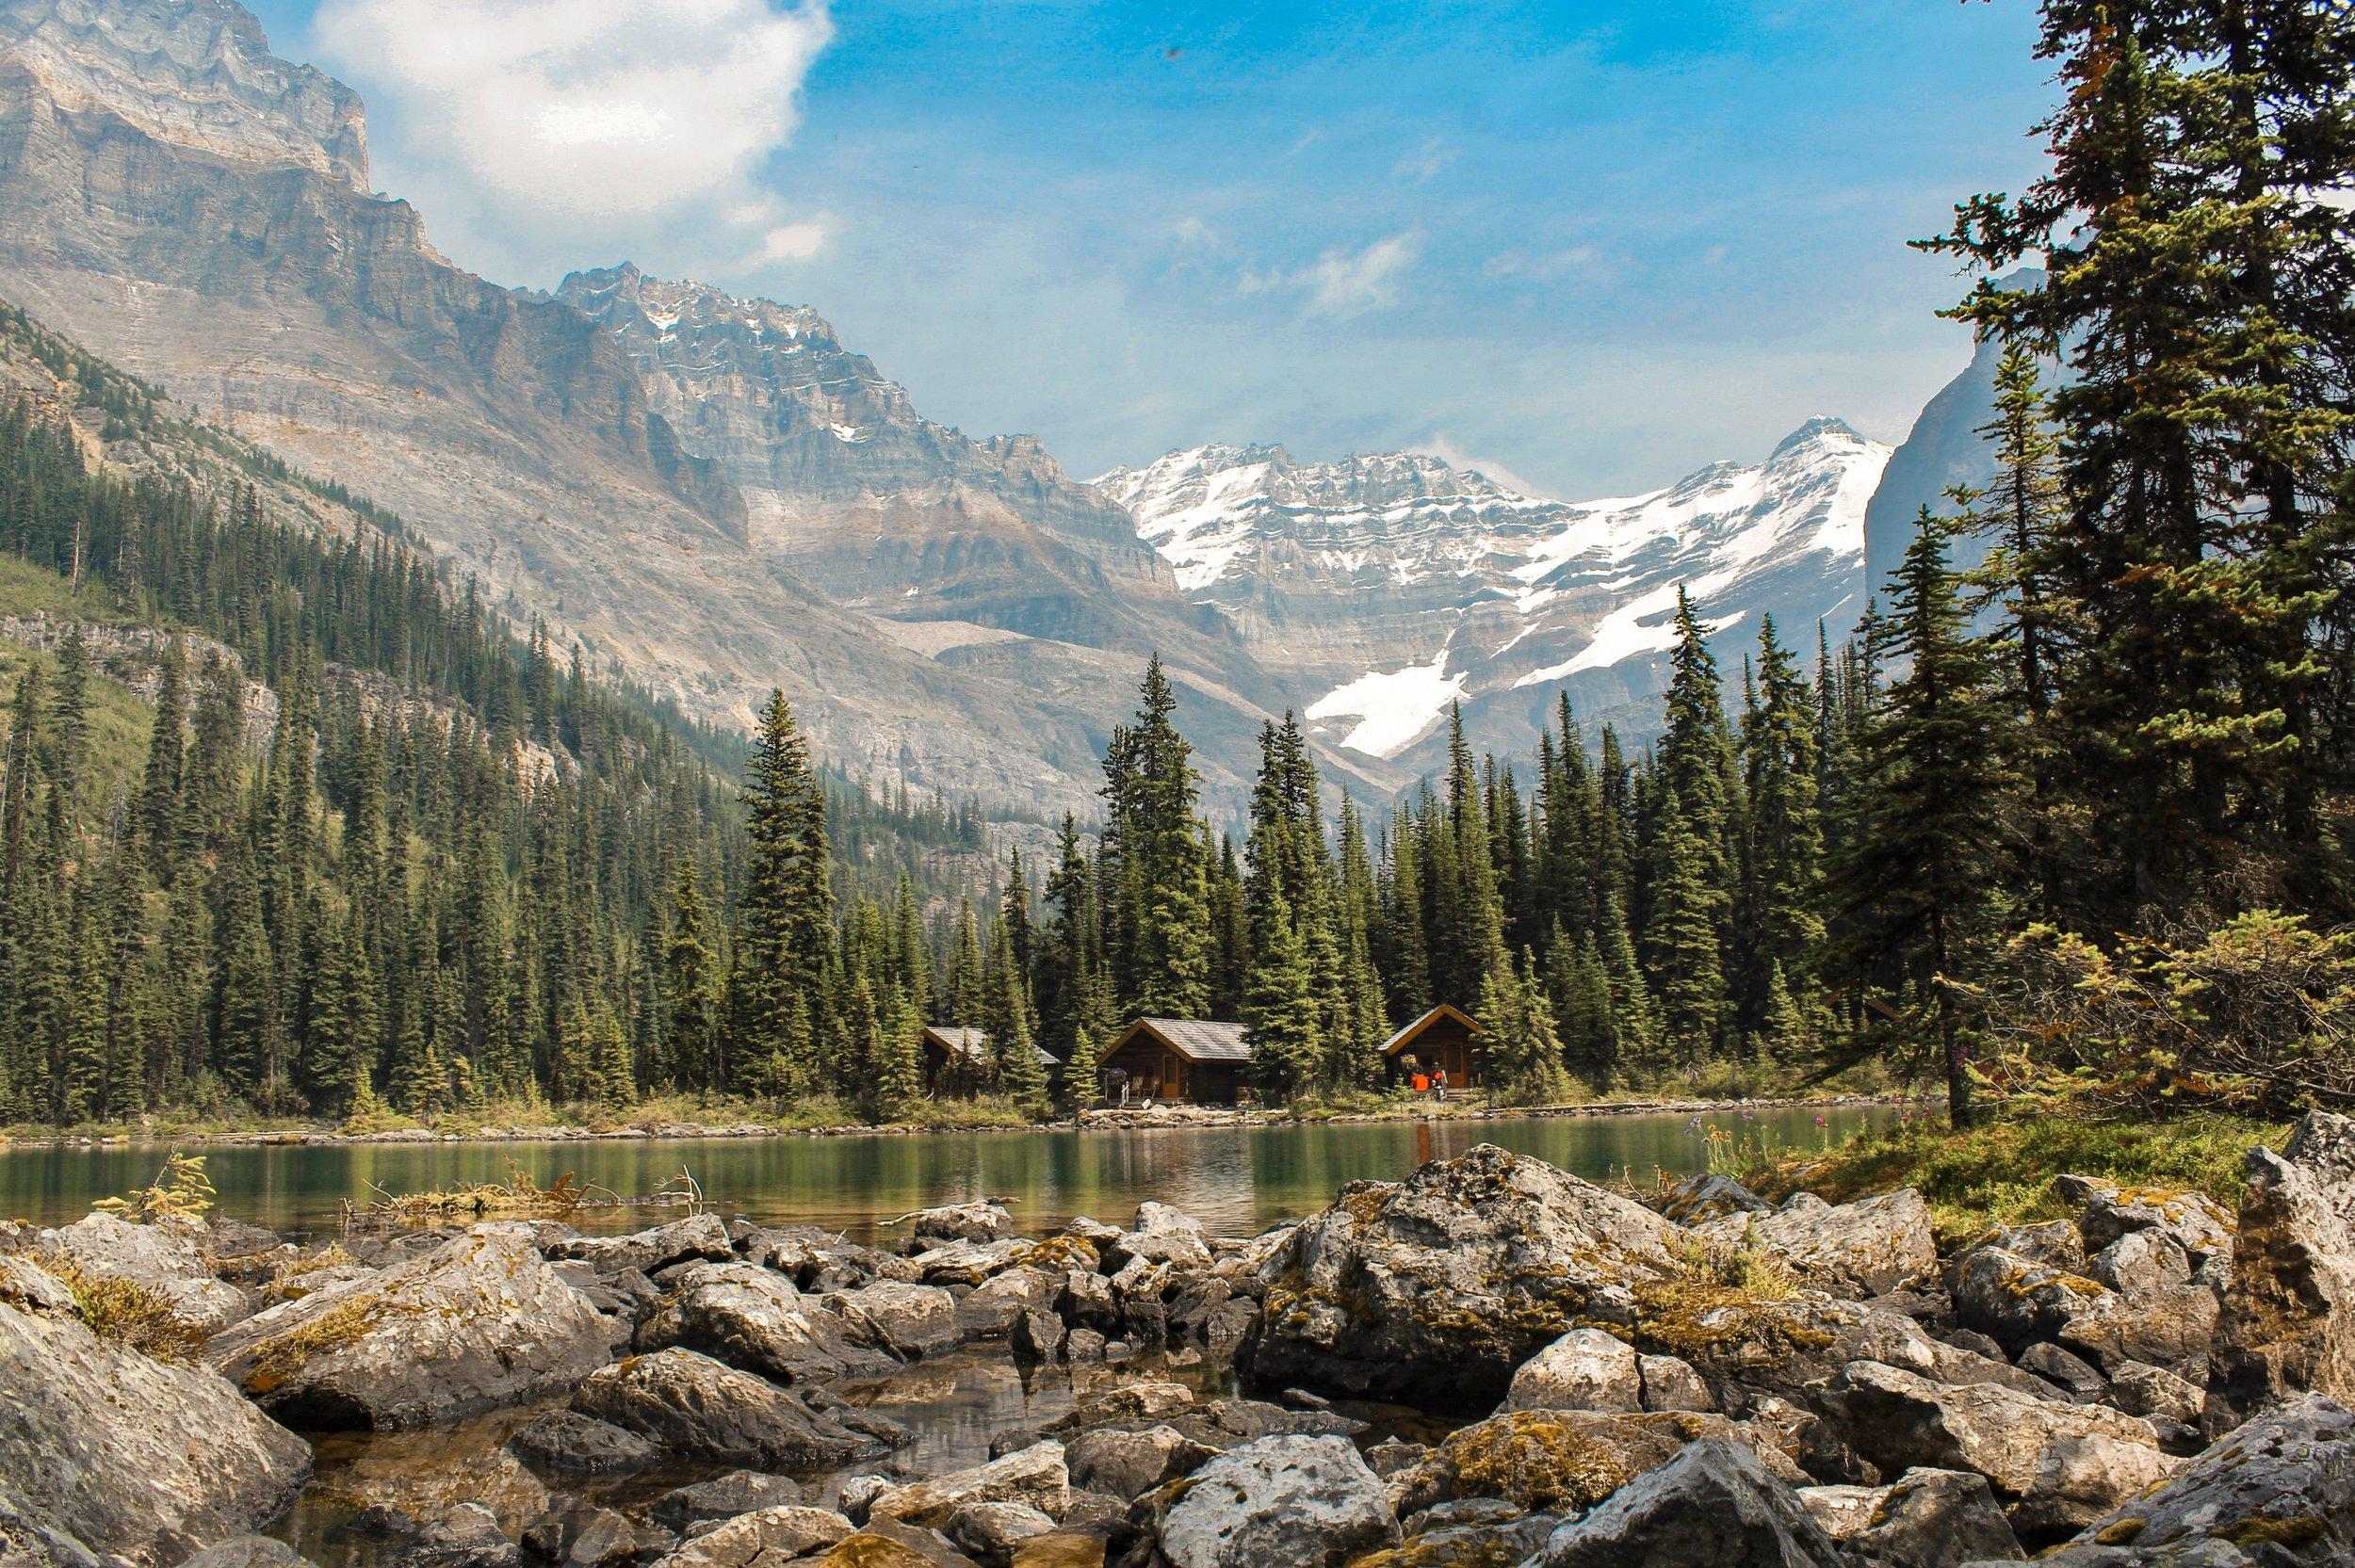 Lake O'Hara lodge cabins